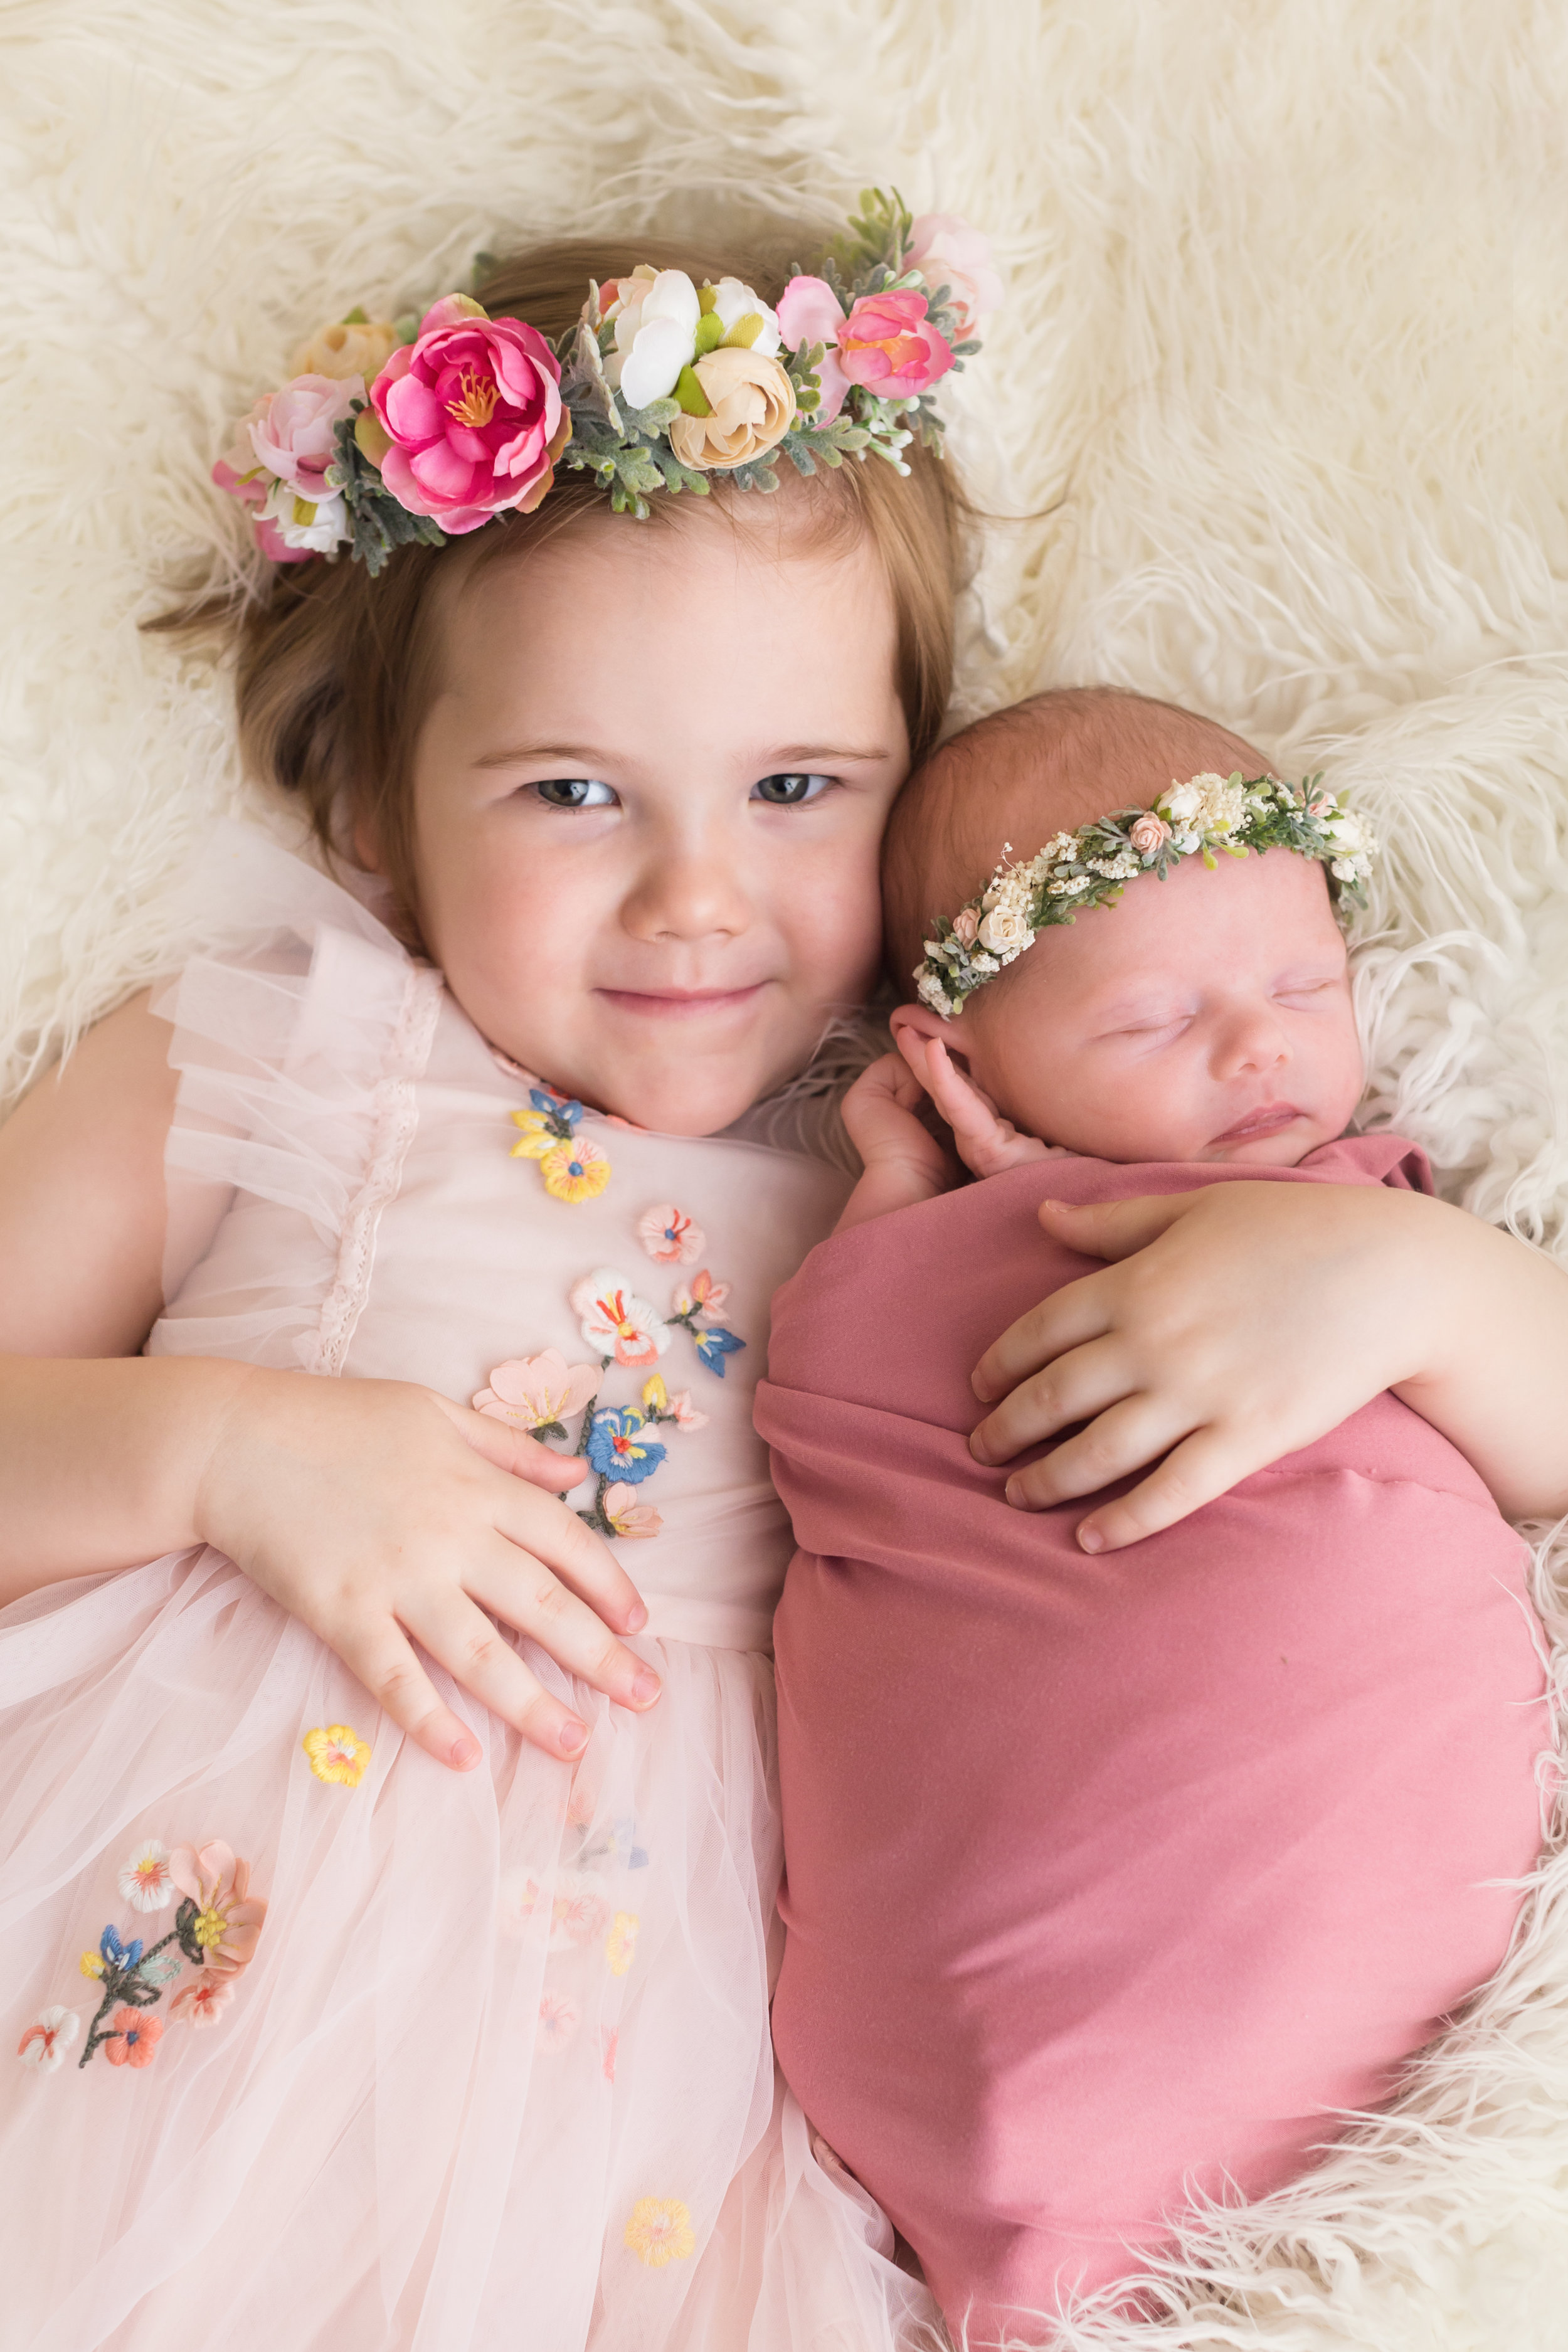 newborn sisters photoshoot www.carleykelley.com